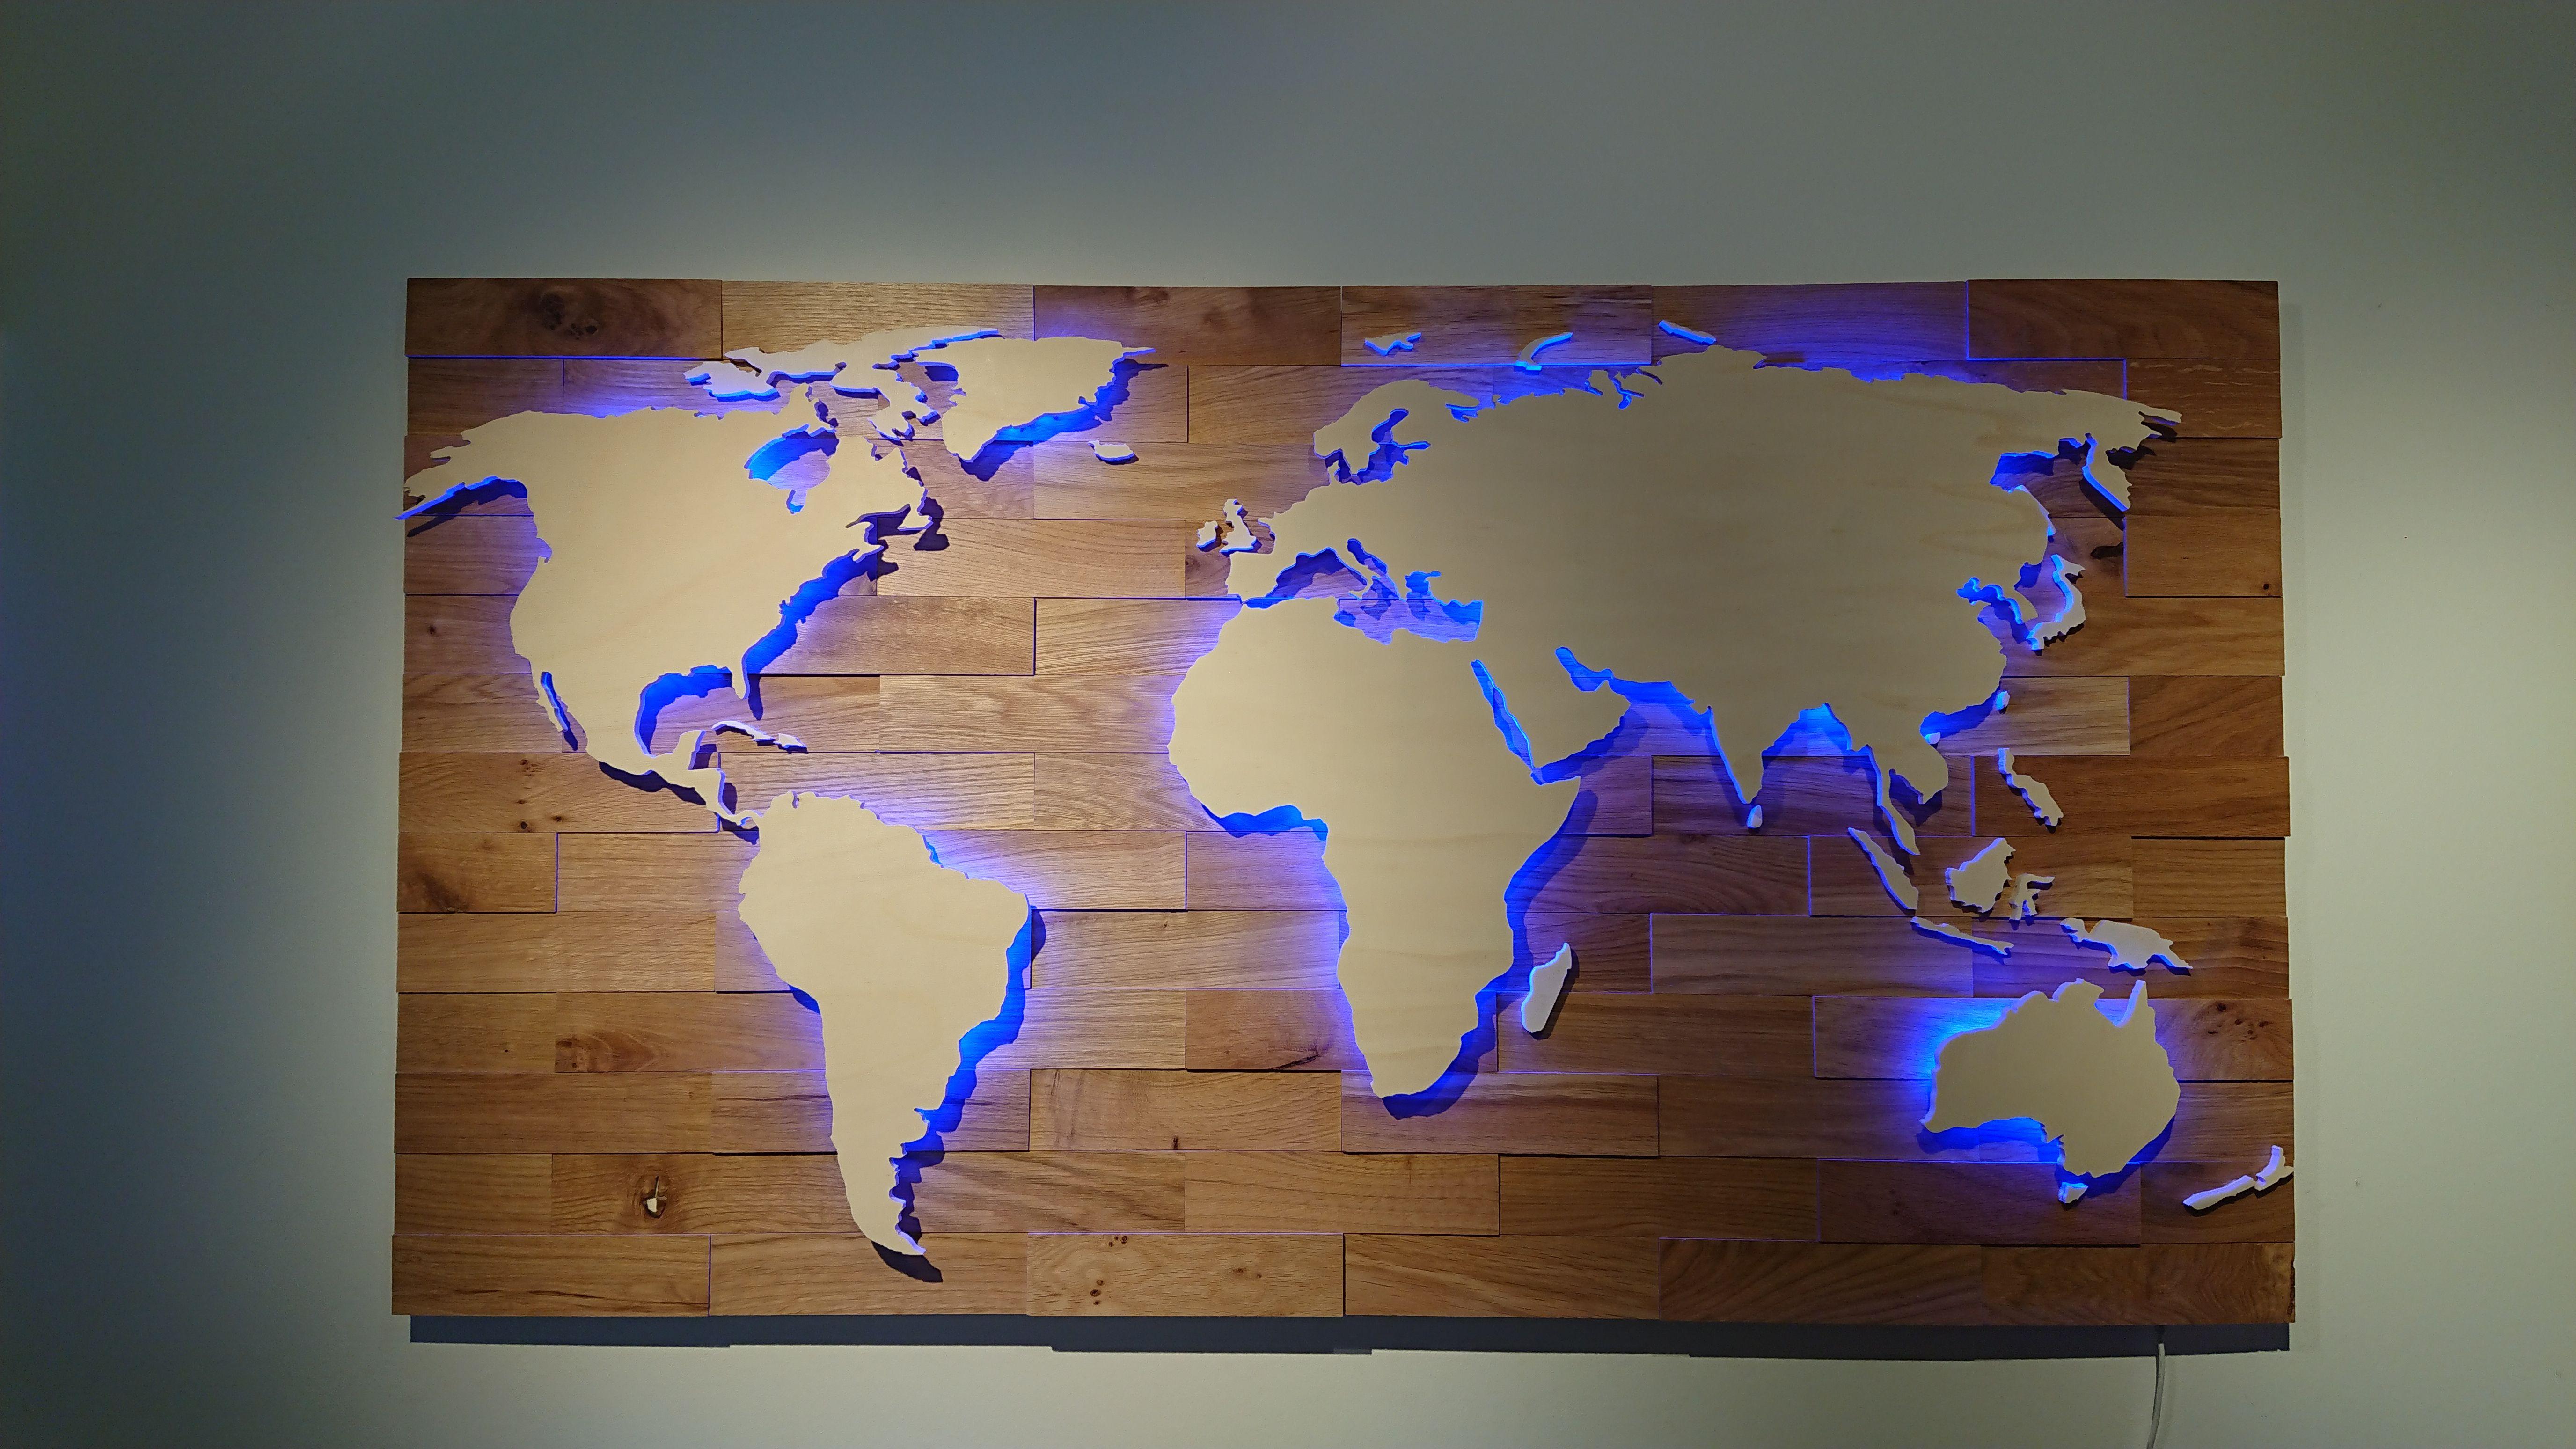 Weltkarte Aus Holz Led Beleuchtung Eiche Rustikal Weltkarte Aus Holz Weltkarte Led Beleuchtung